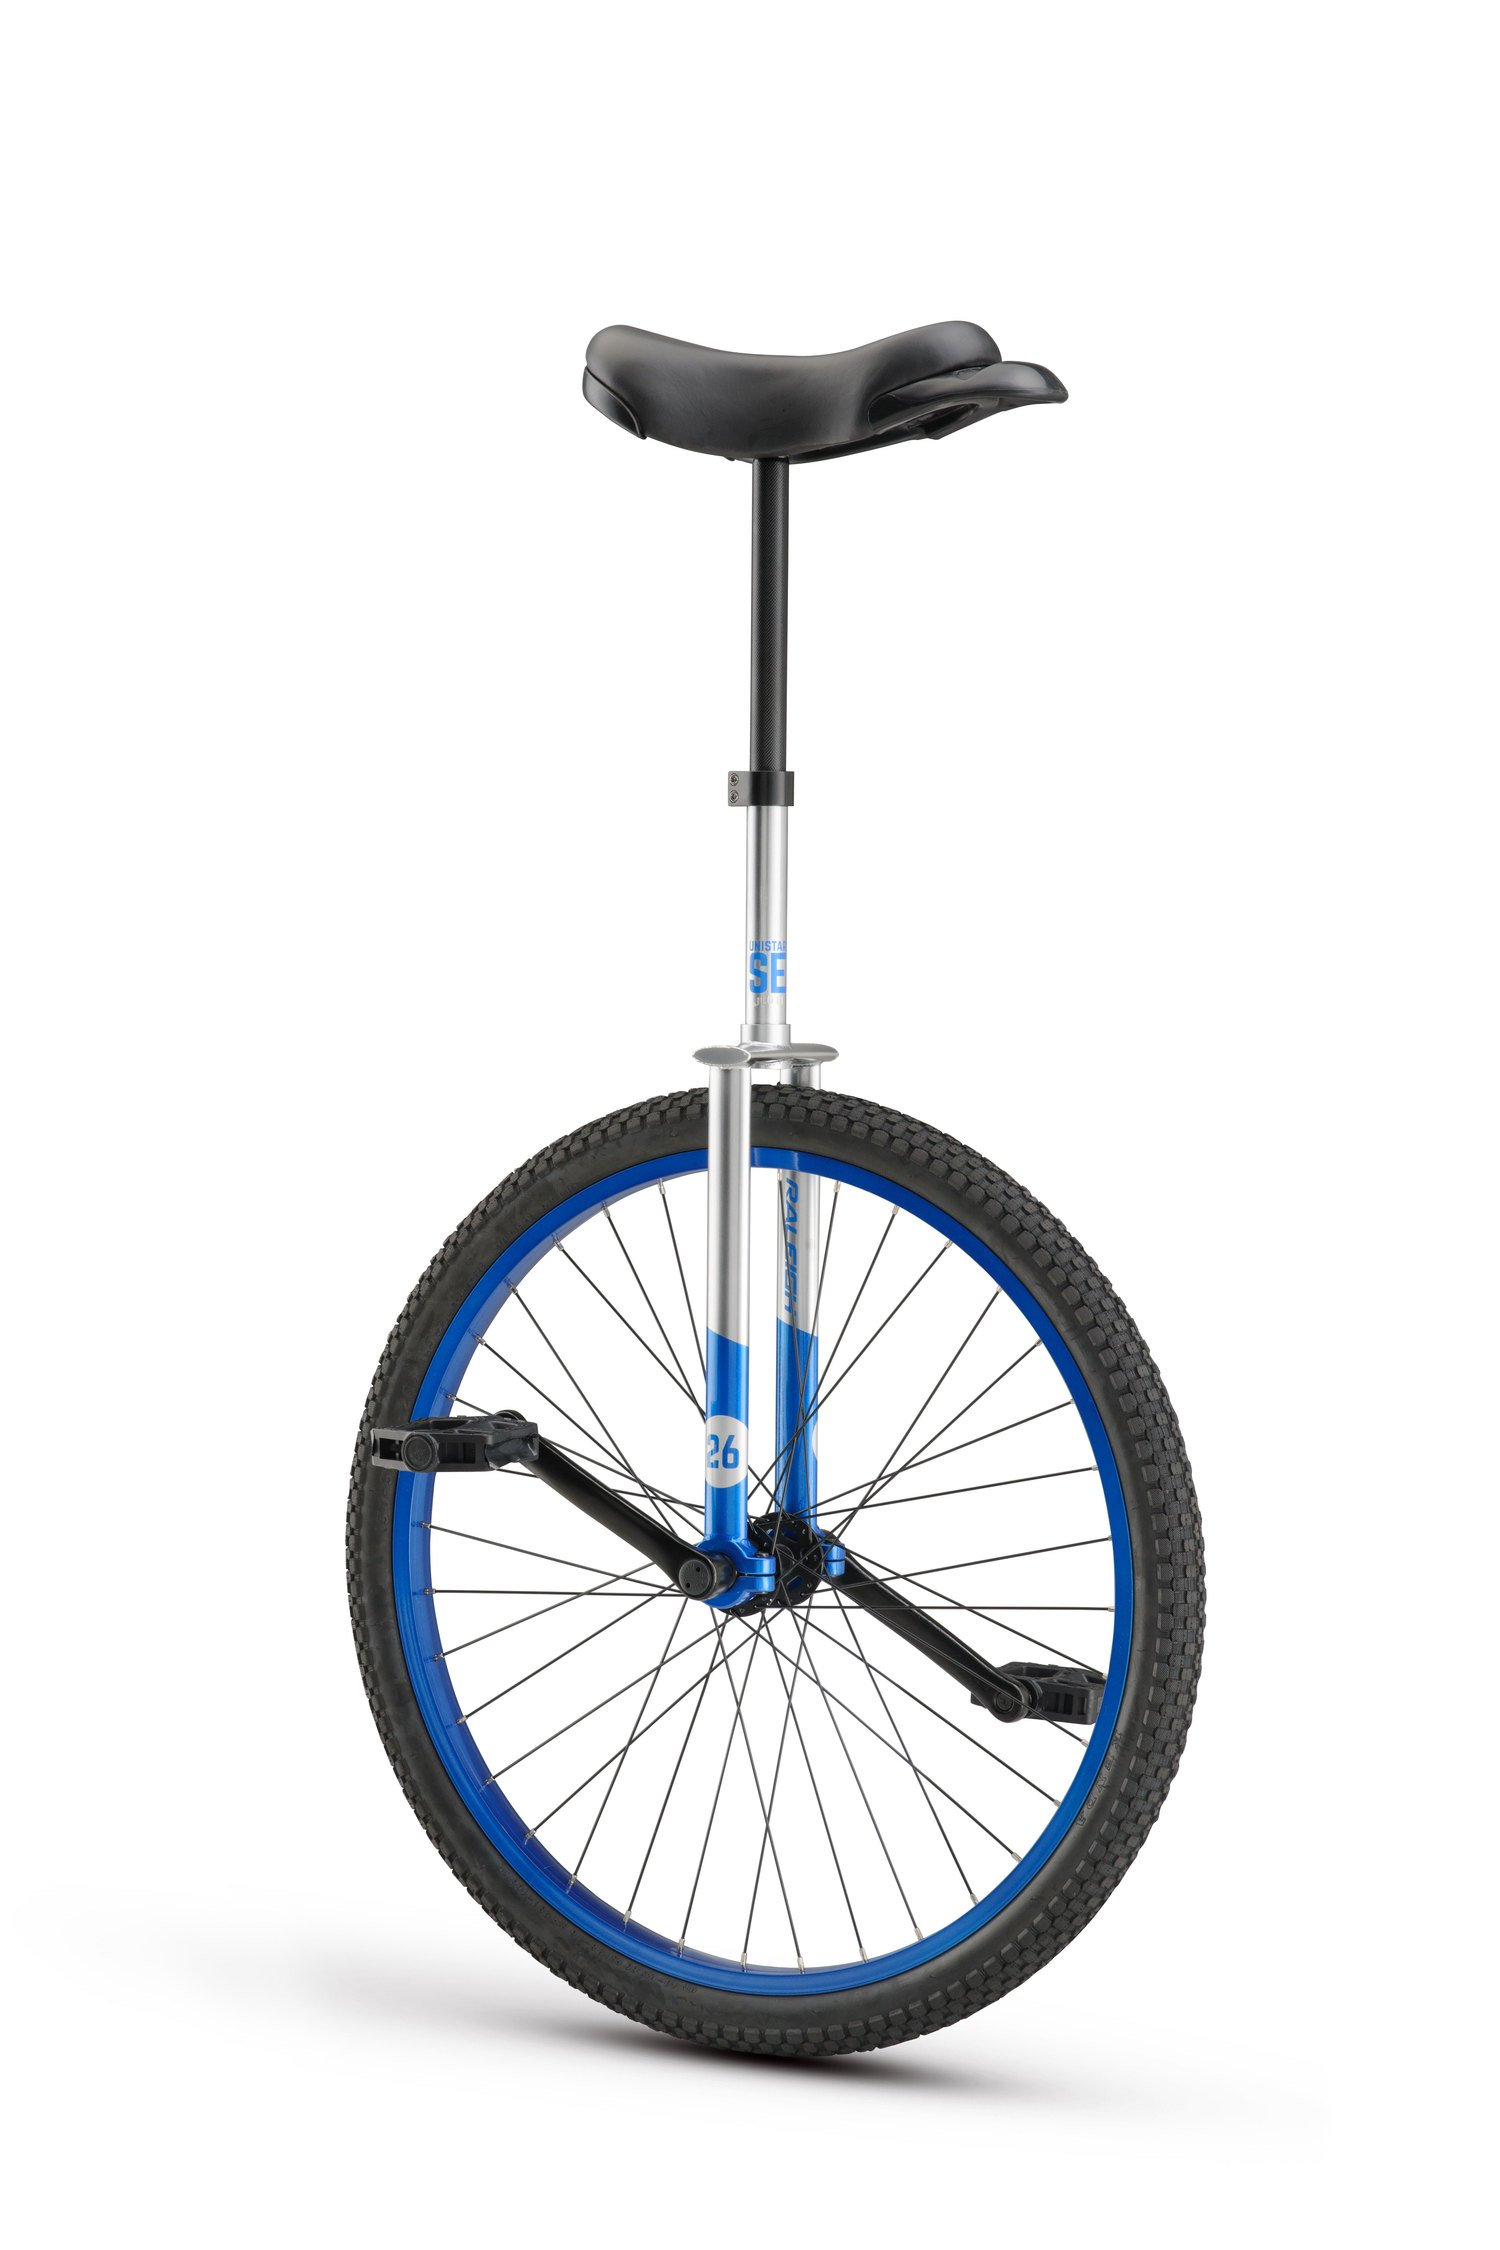 Unistar SE 26, 26inch Wheel Unicycle, Blue